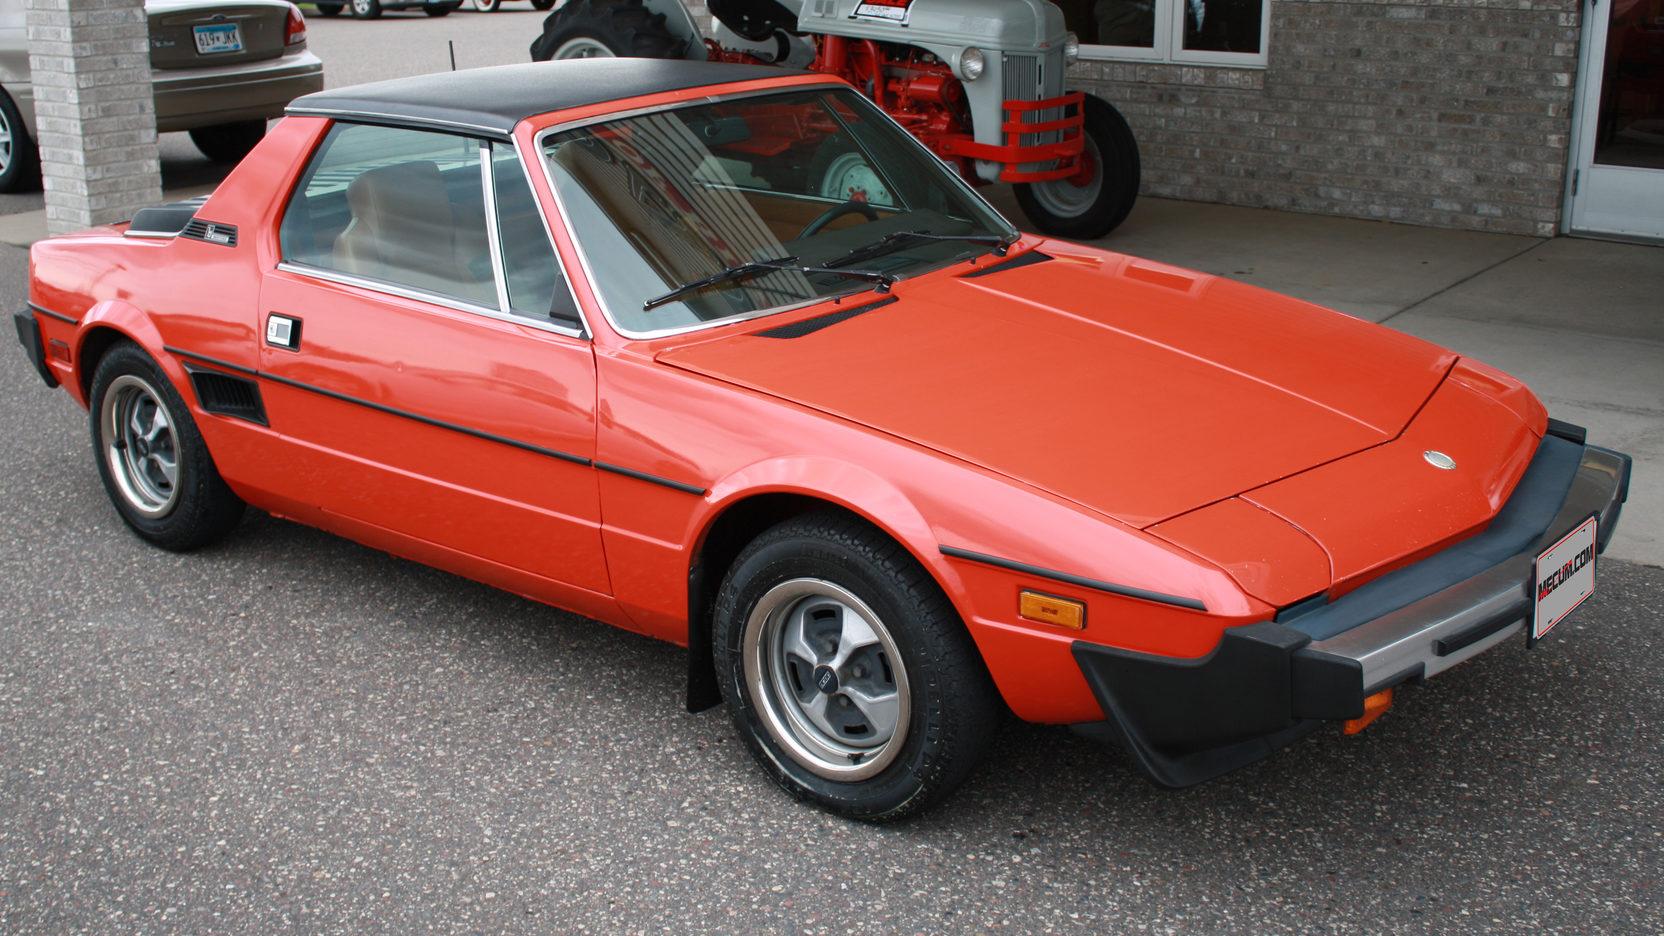 1979 Fiat X1/9